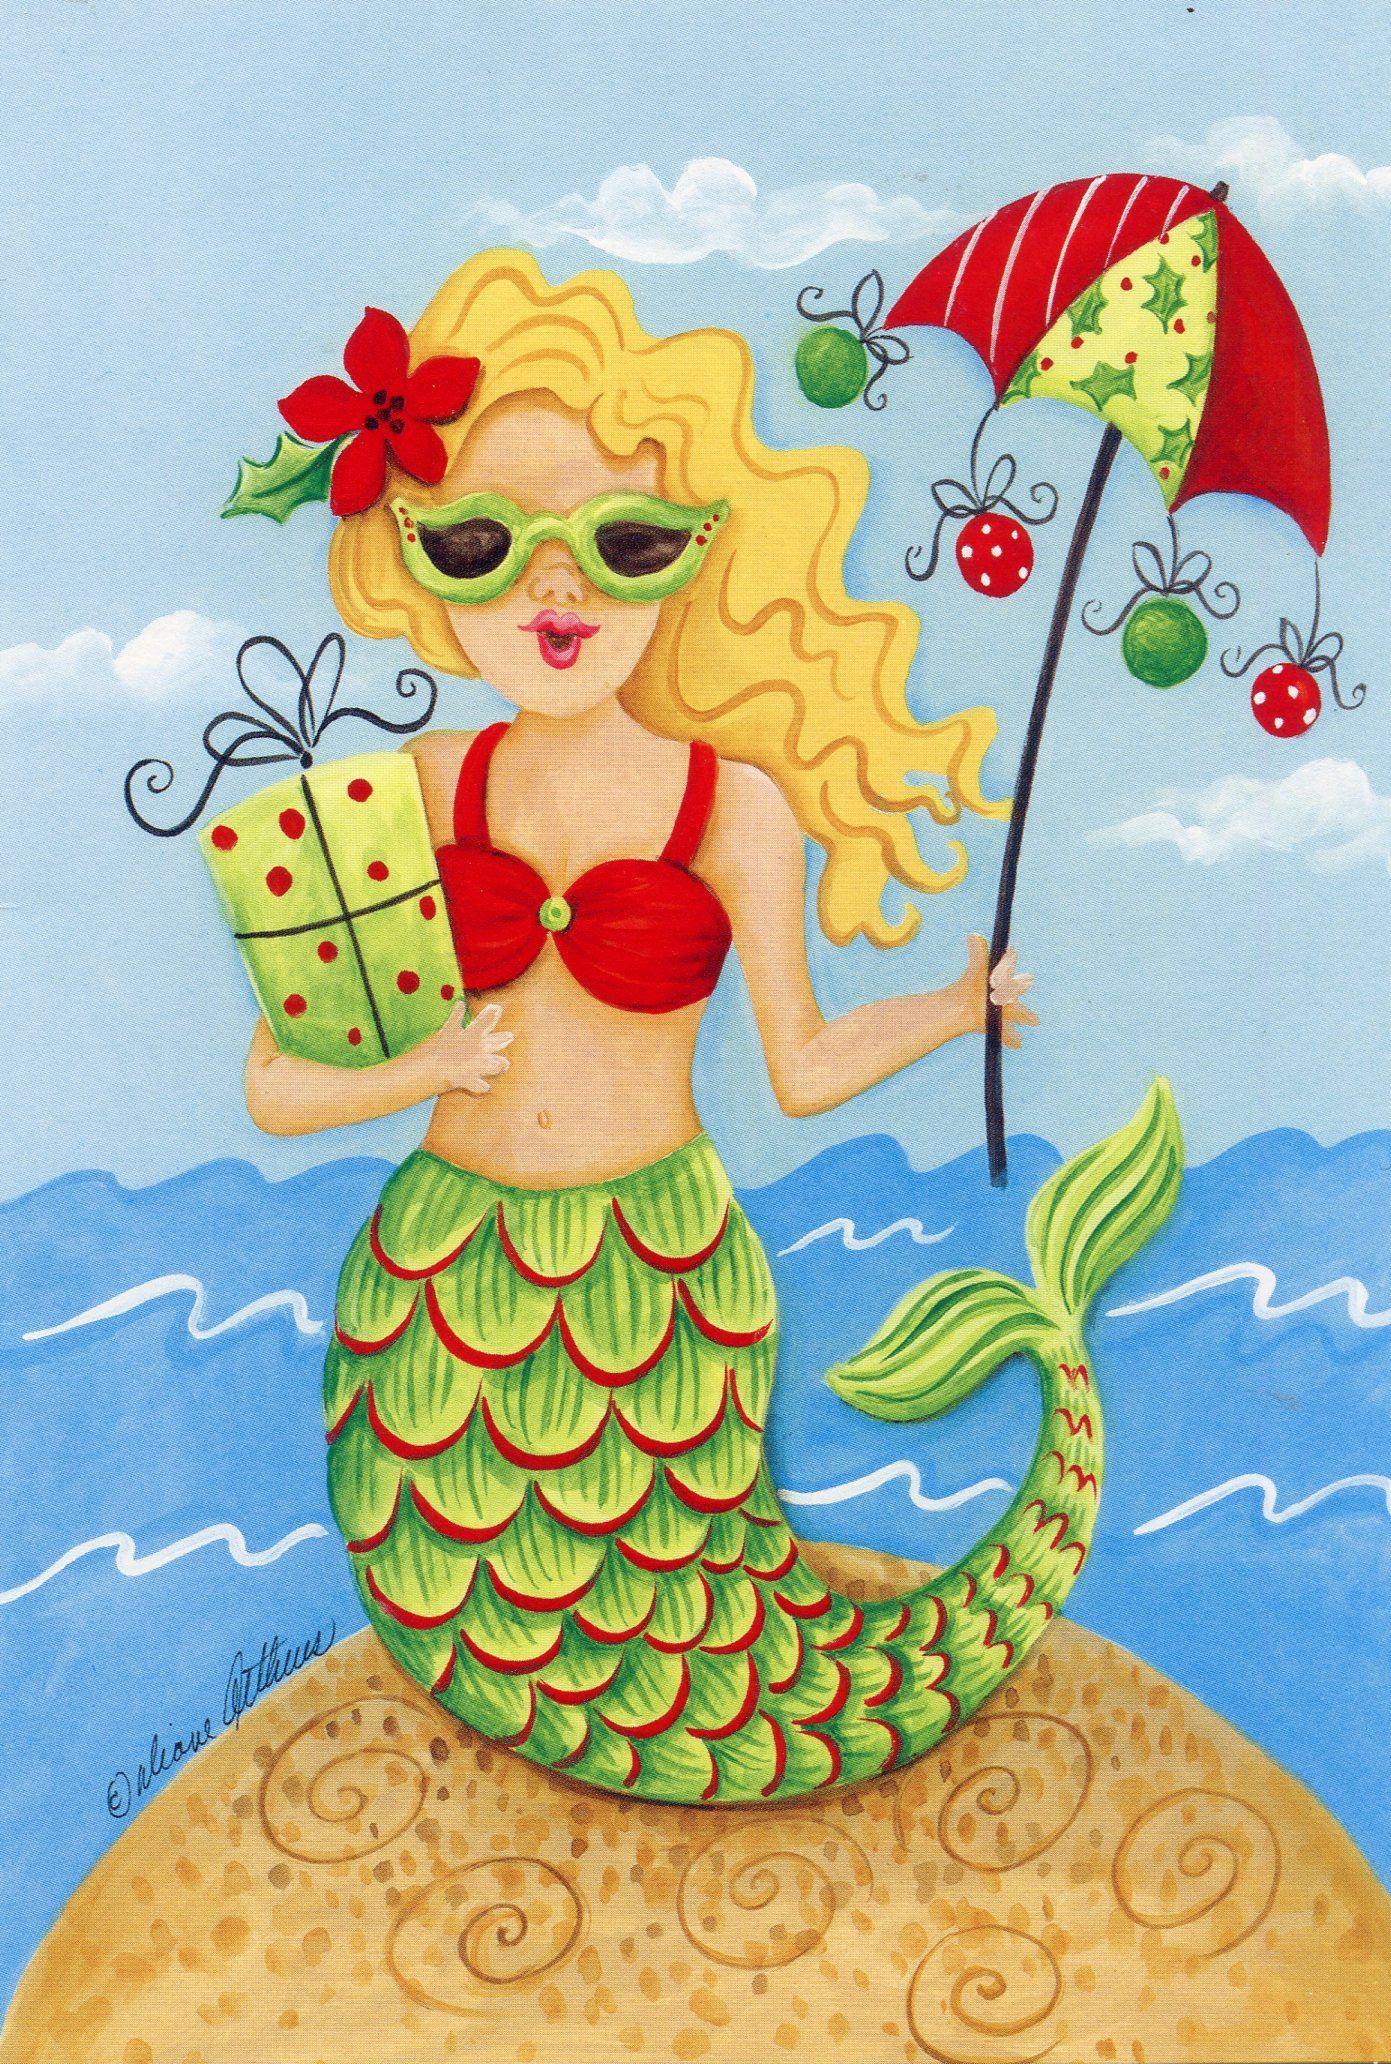 Mermaid by Diane Arthurs